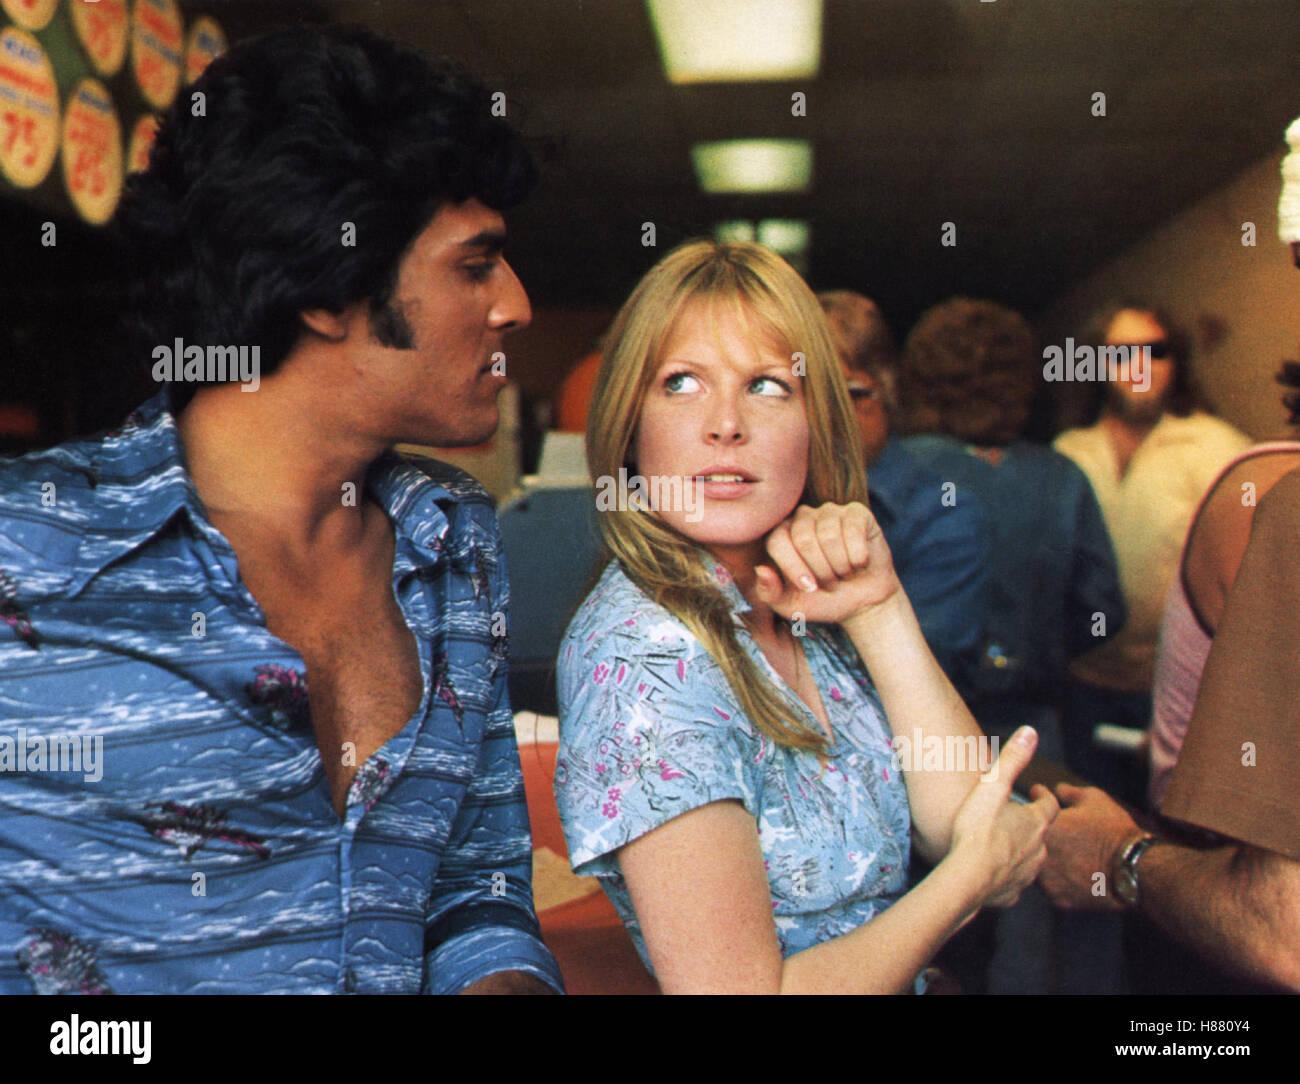 T Heffron Stock Photos & T Heffron Stock Images - Alamy